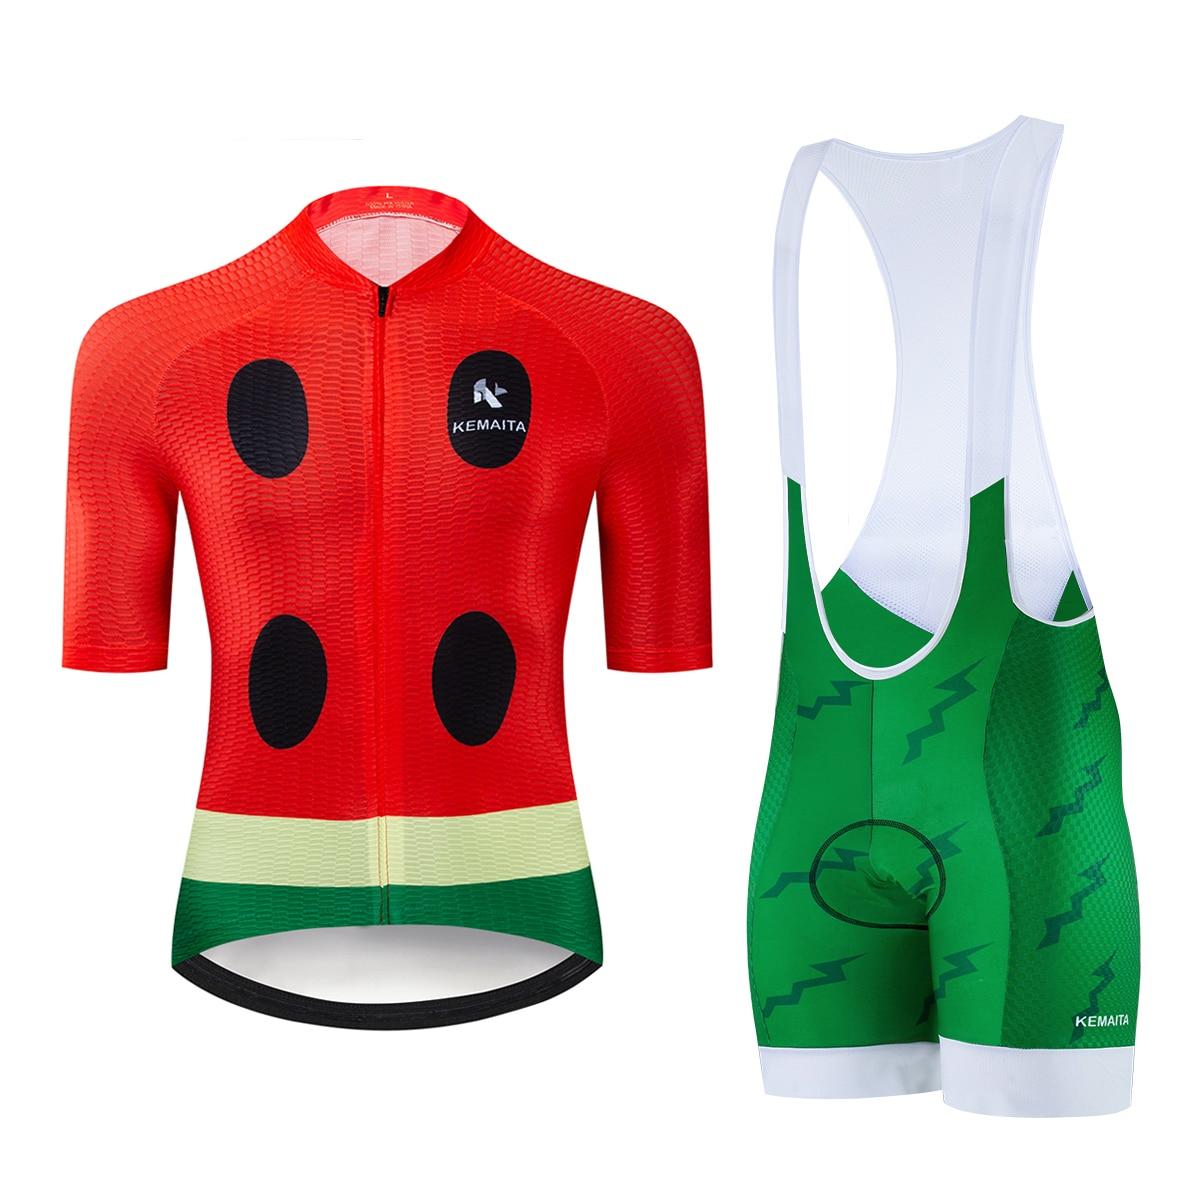 Kemaita conjunto de ciclismo, conjunto de ciclismo engraçado, design de melancia, camisa de ciclismo, profissional, mtb pro